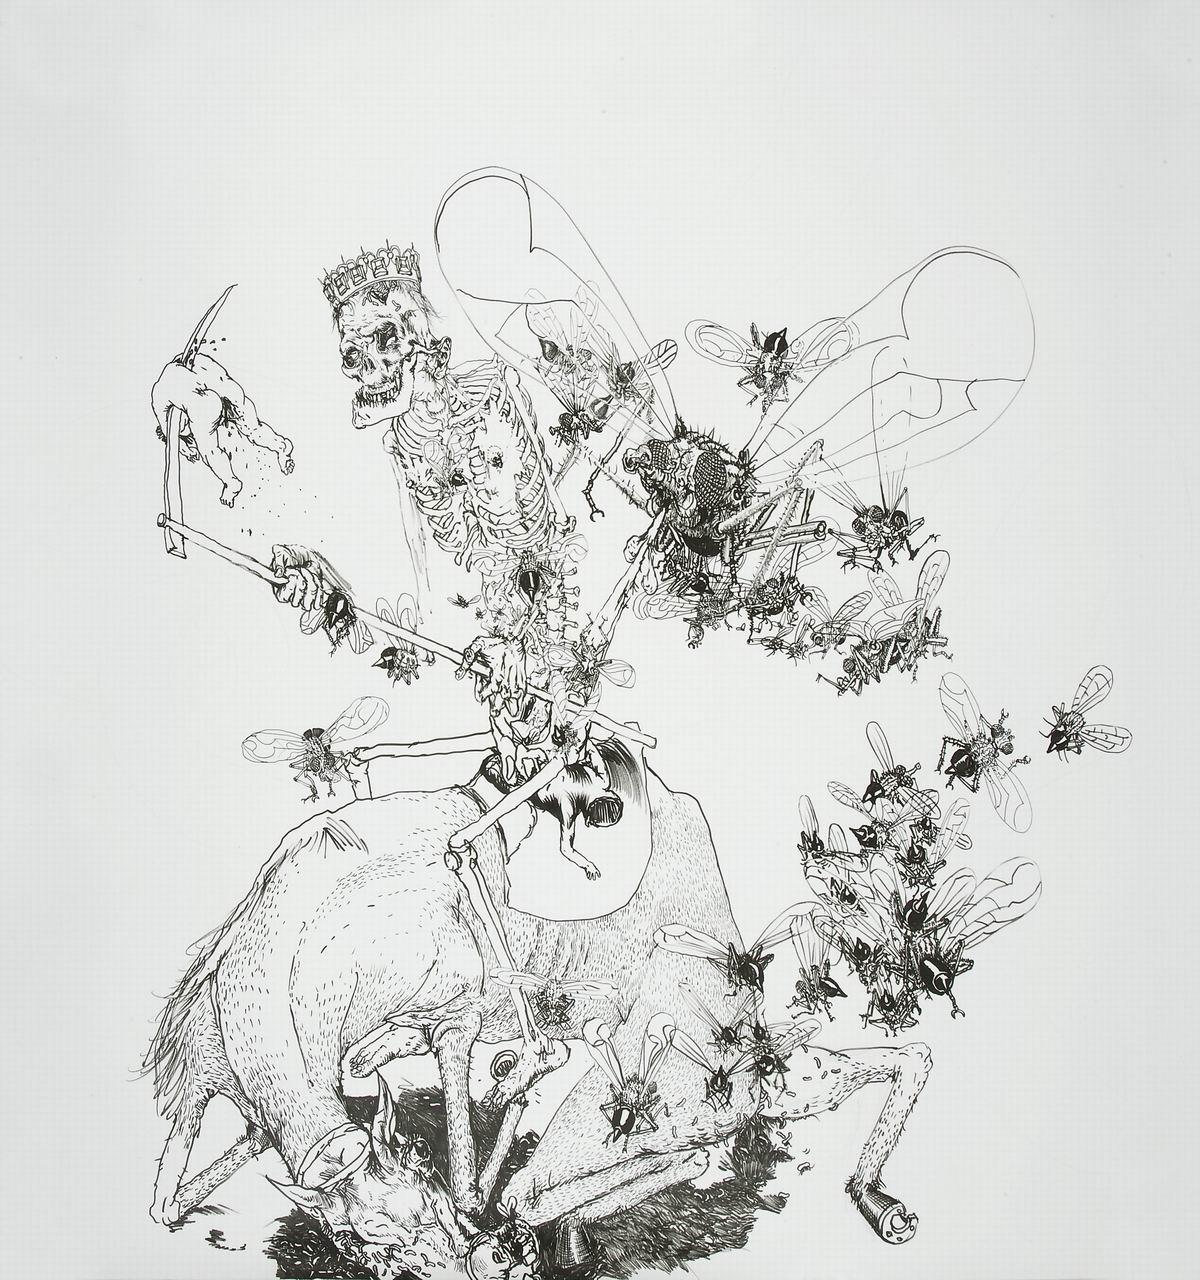 Drawinging - König Tod zu Pferde IV, 2010